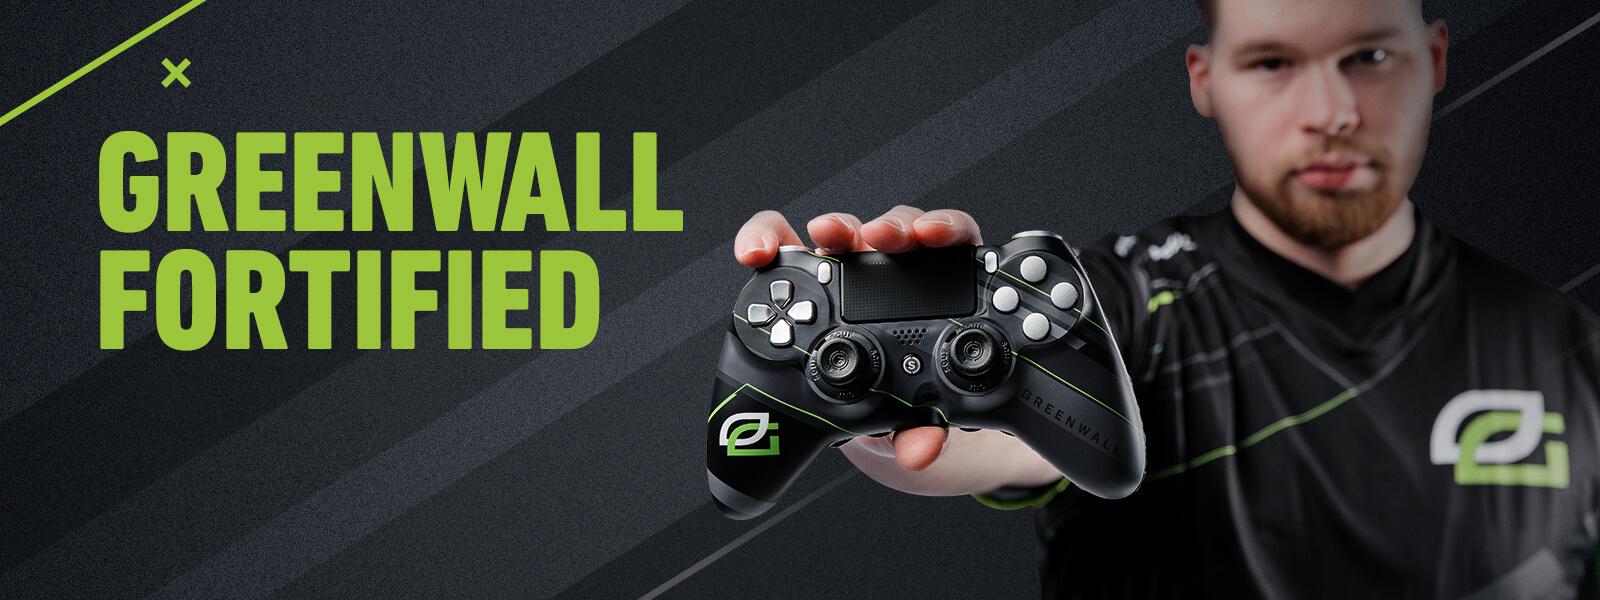 Optic Gaming - Greenwall Fortified